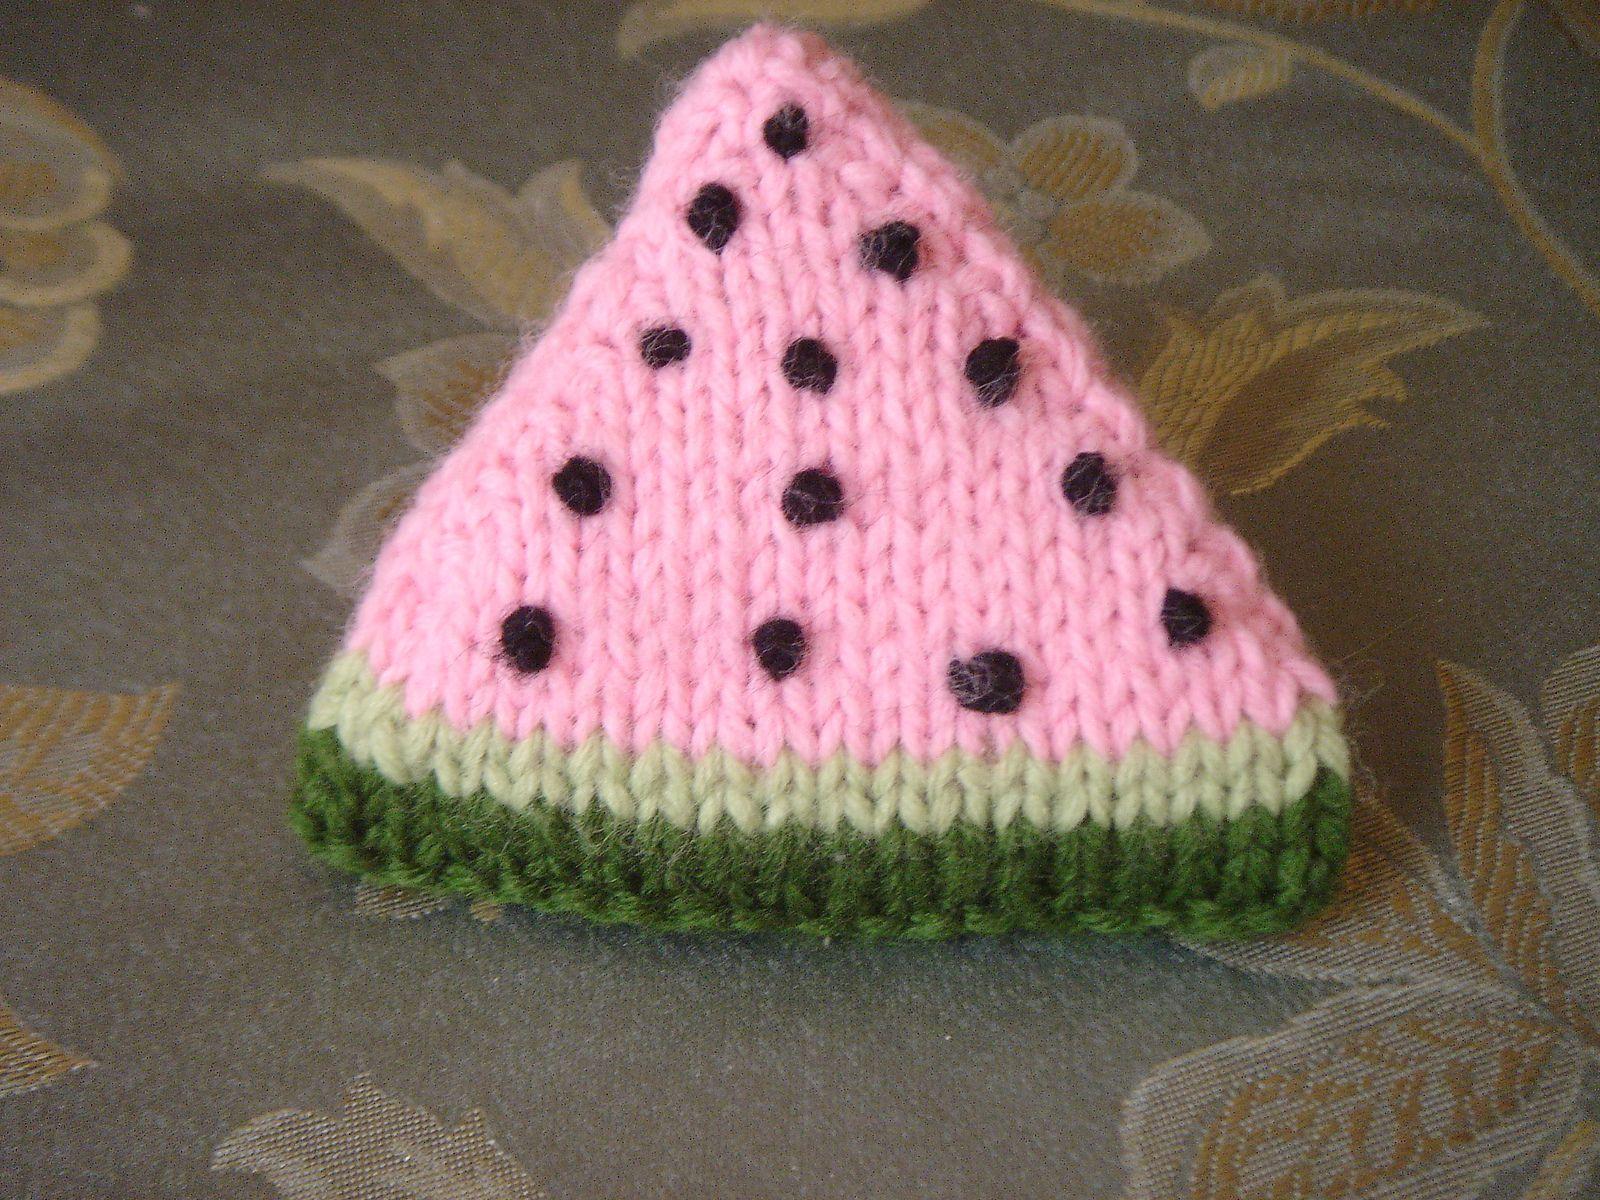 Ravelry watermelon slice knitting pattern by megan hall free ravelry watermelon slice knitting pattern by megan hall free bankloansurffo Images